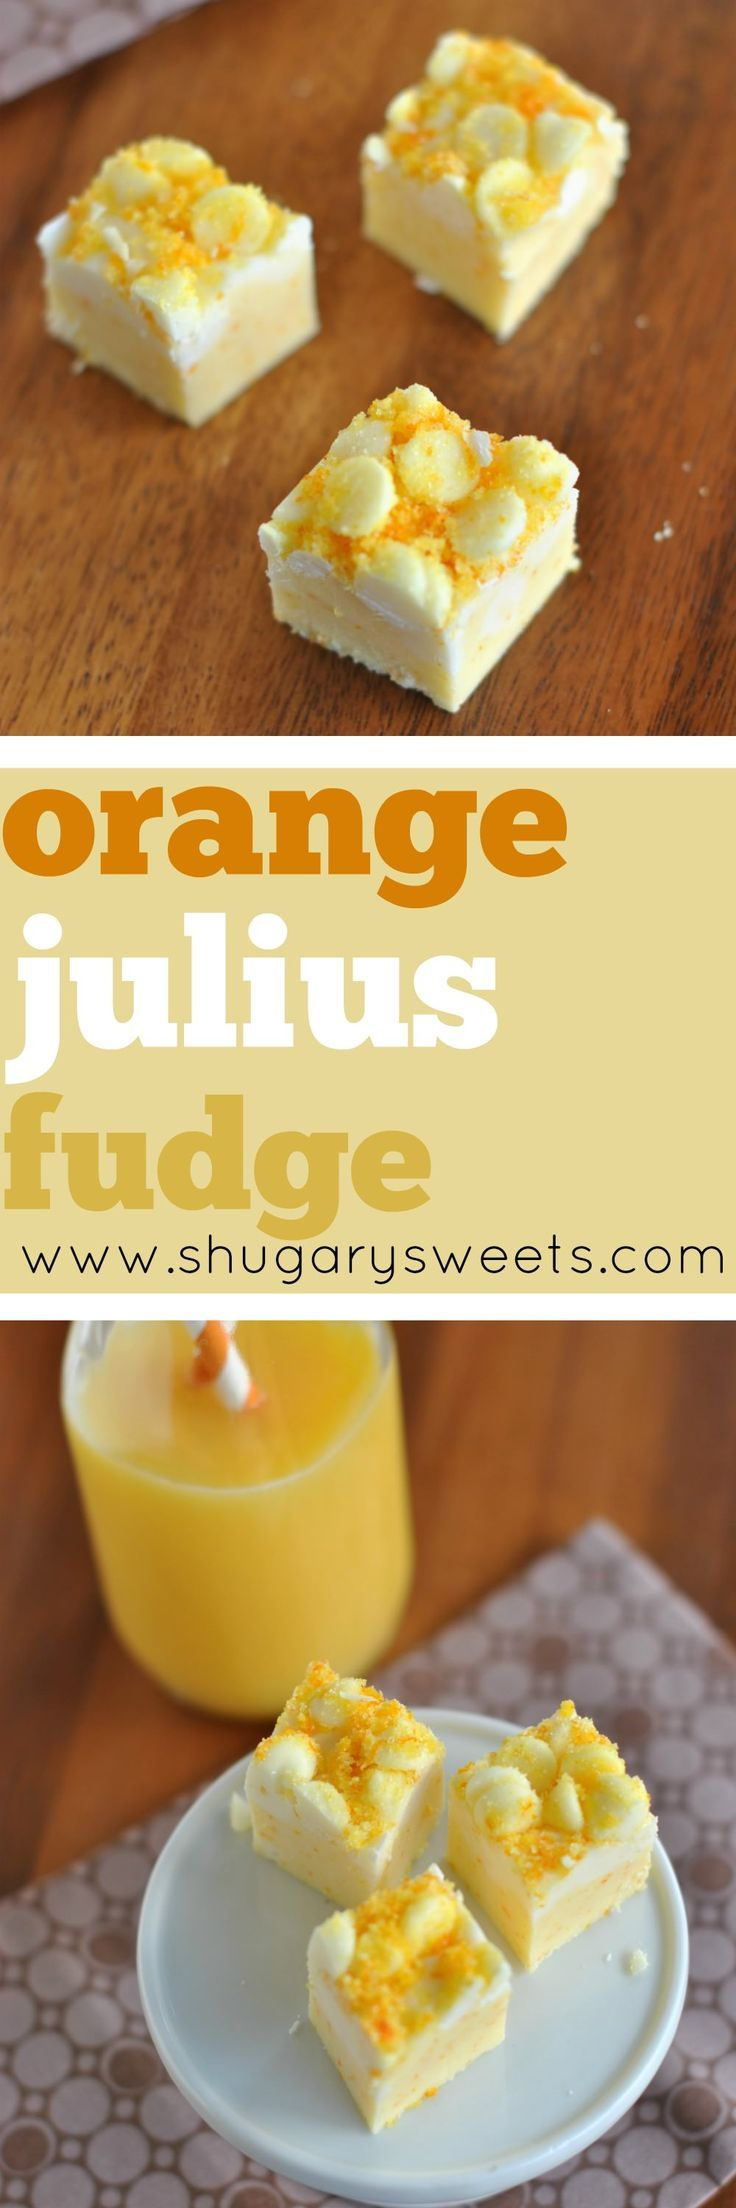 Orange Julius Fudge: tastes like the drink in a delicious, creamy fudge!